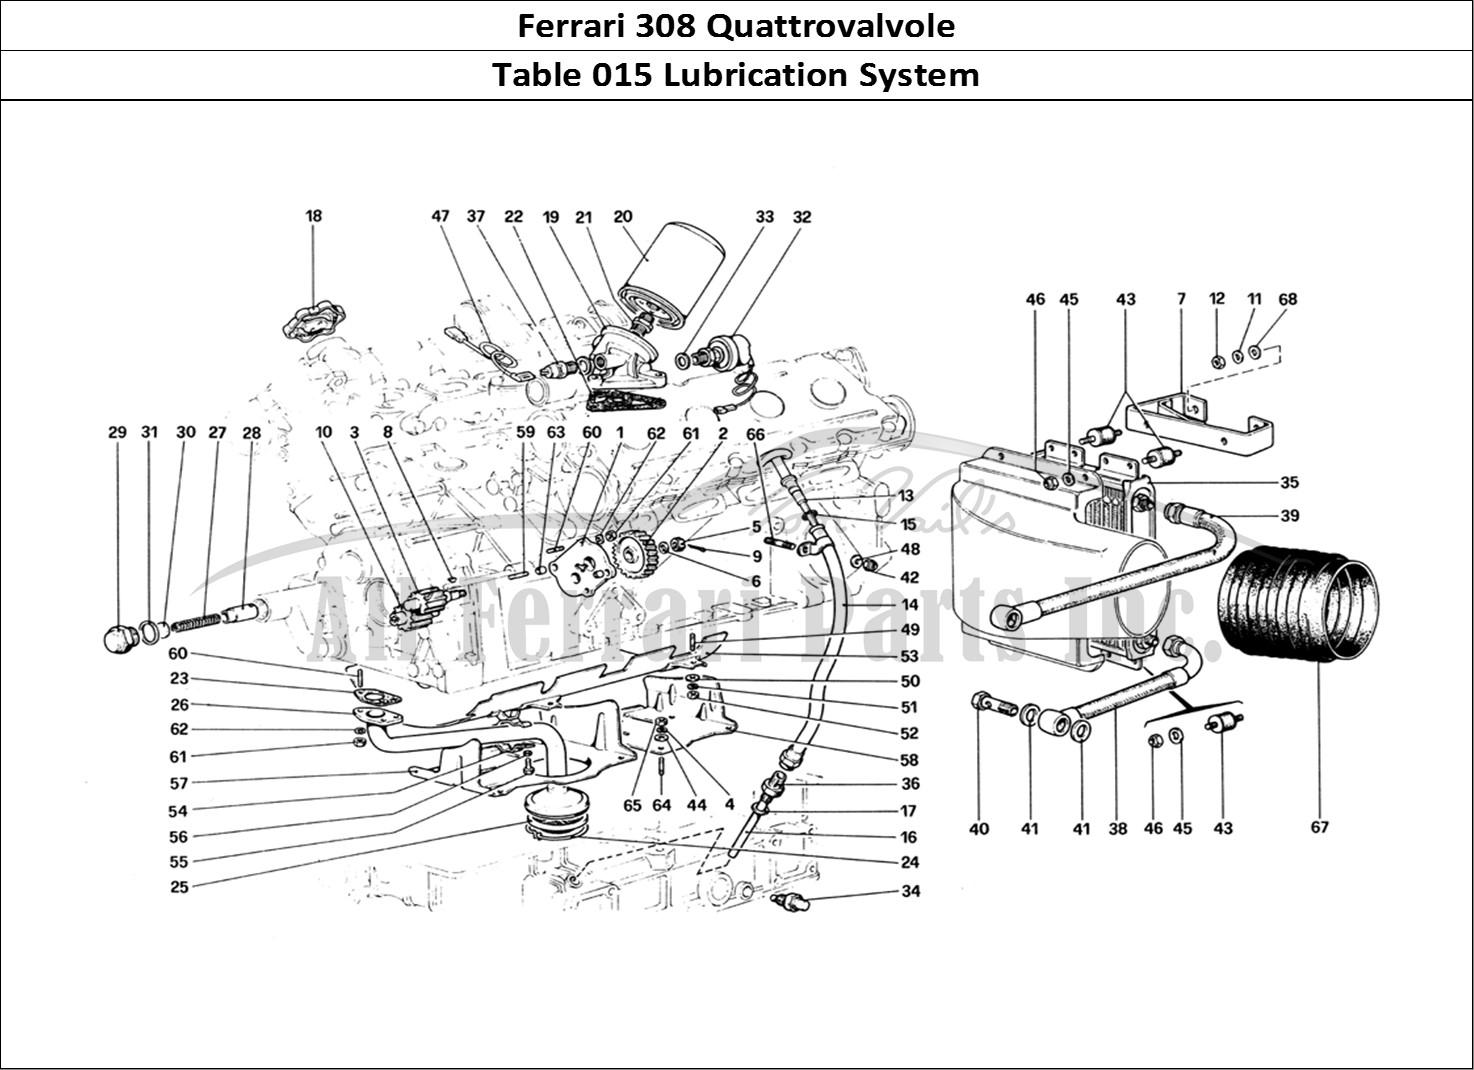 Buy original Ferrari 308 Quattrovalvole 015 Lubrication